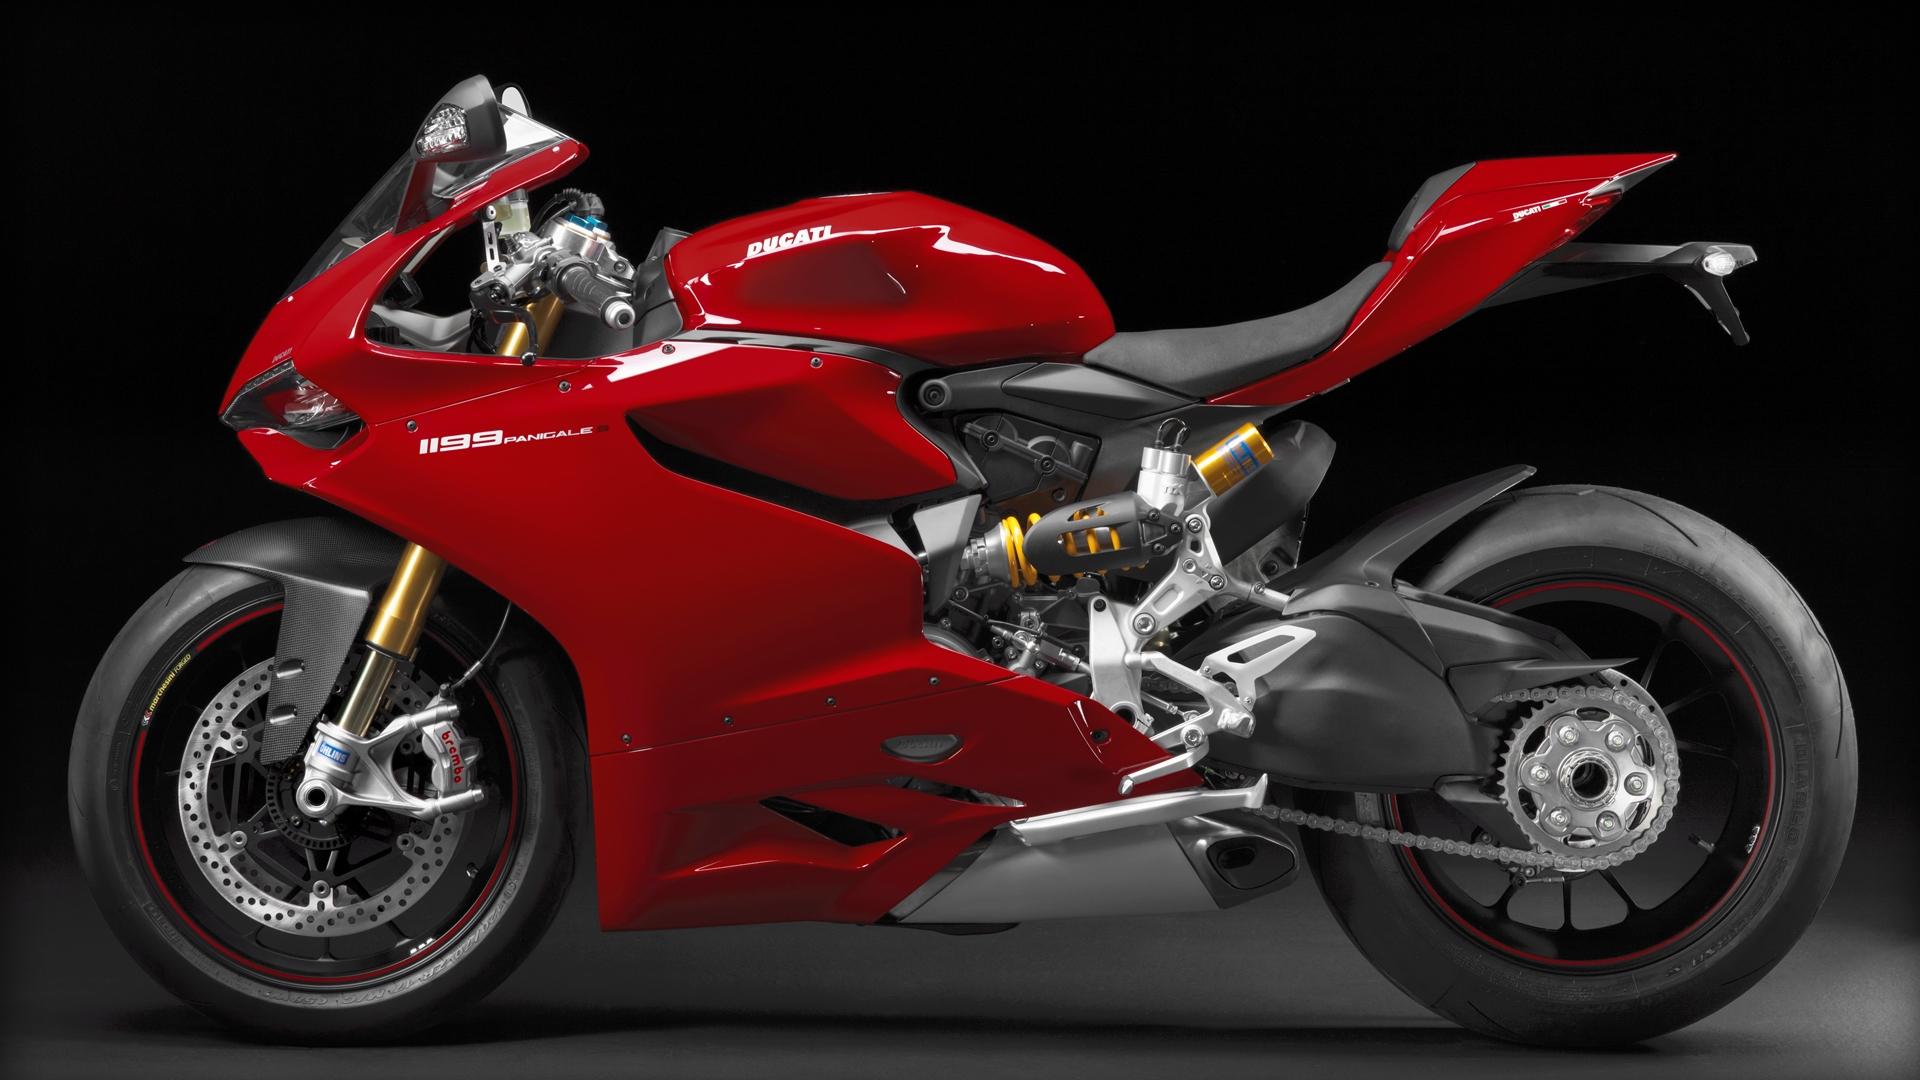 The Ultimate Ducati Has Arrived | Ducati monster